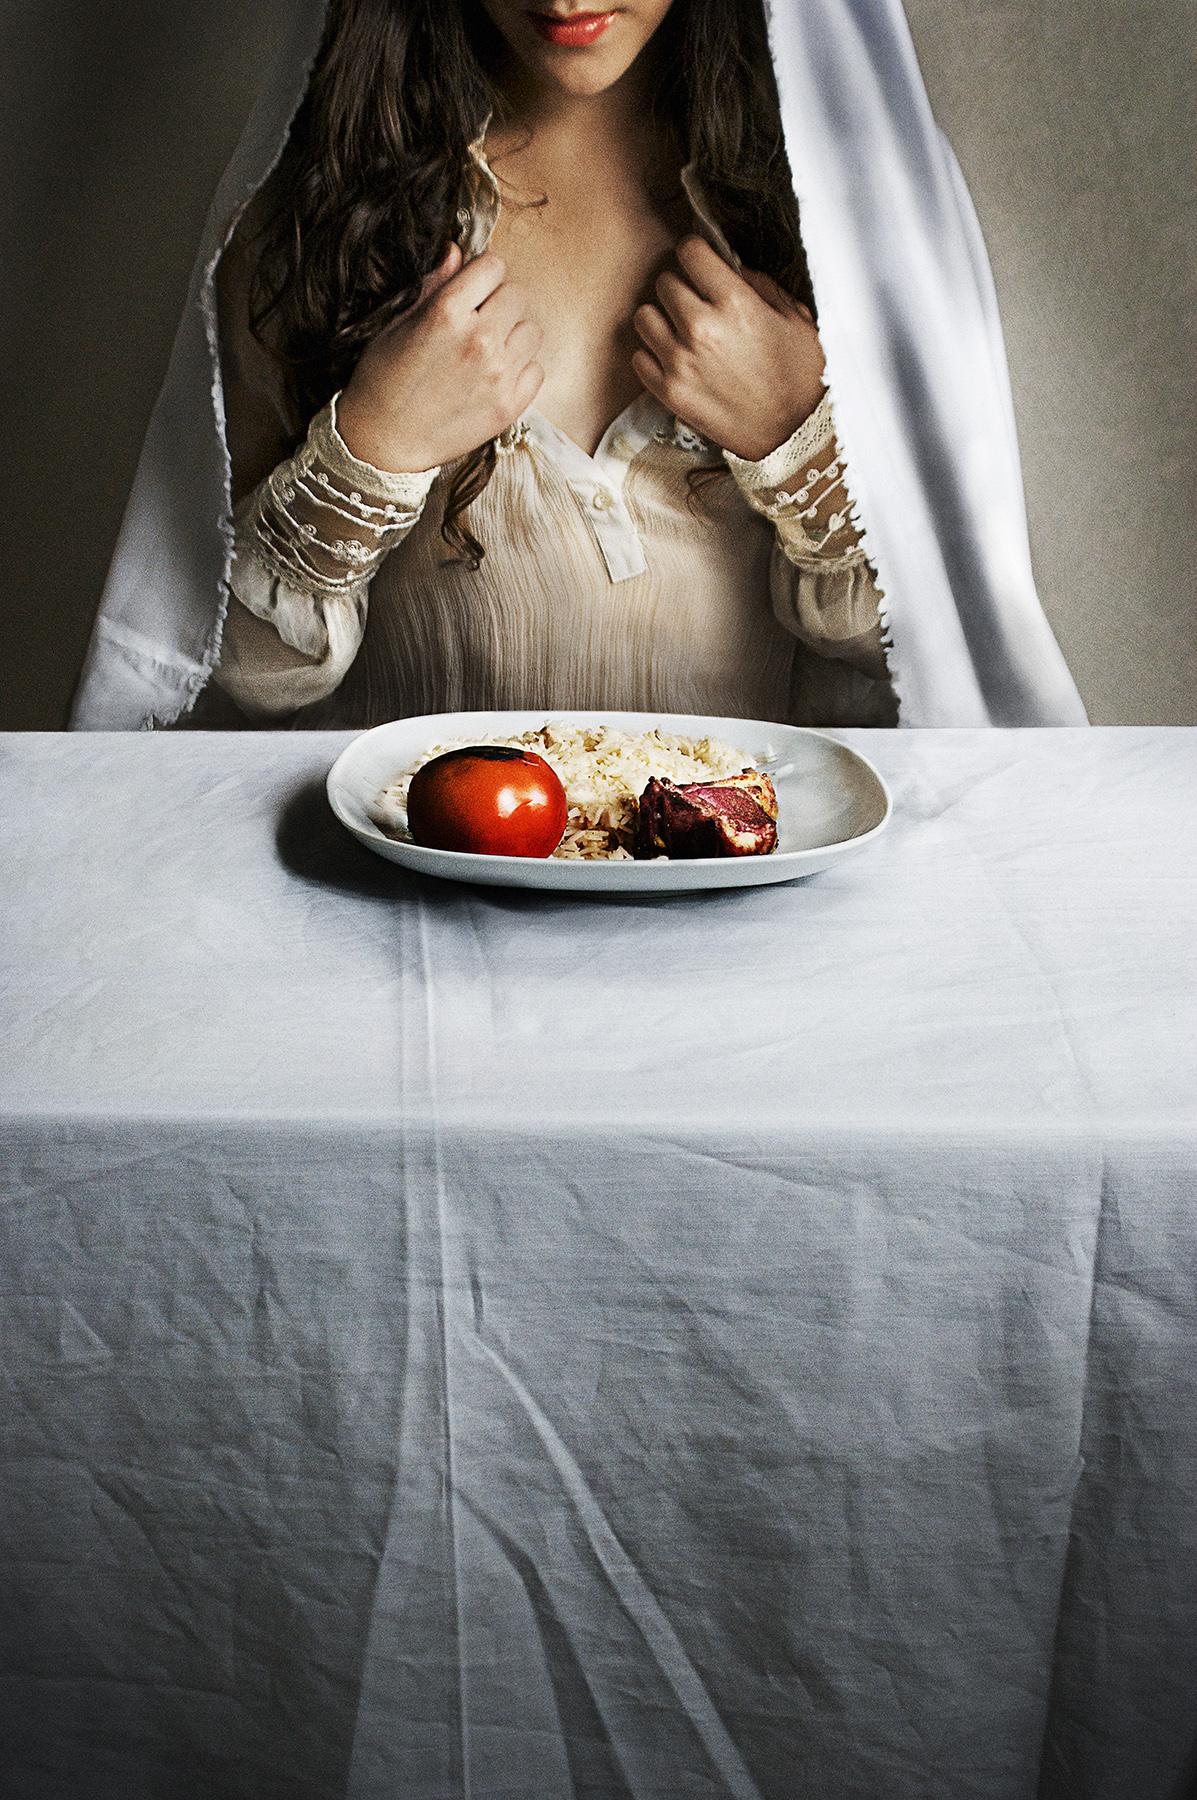 AzadehAvije-The Last Supper.jpg